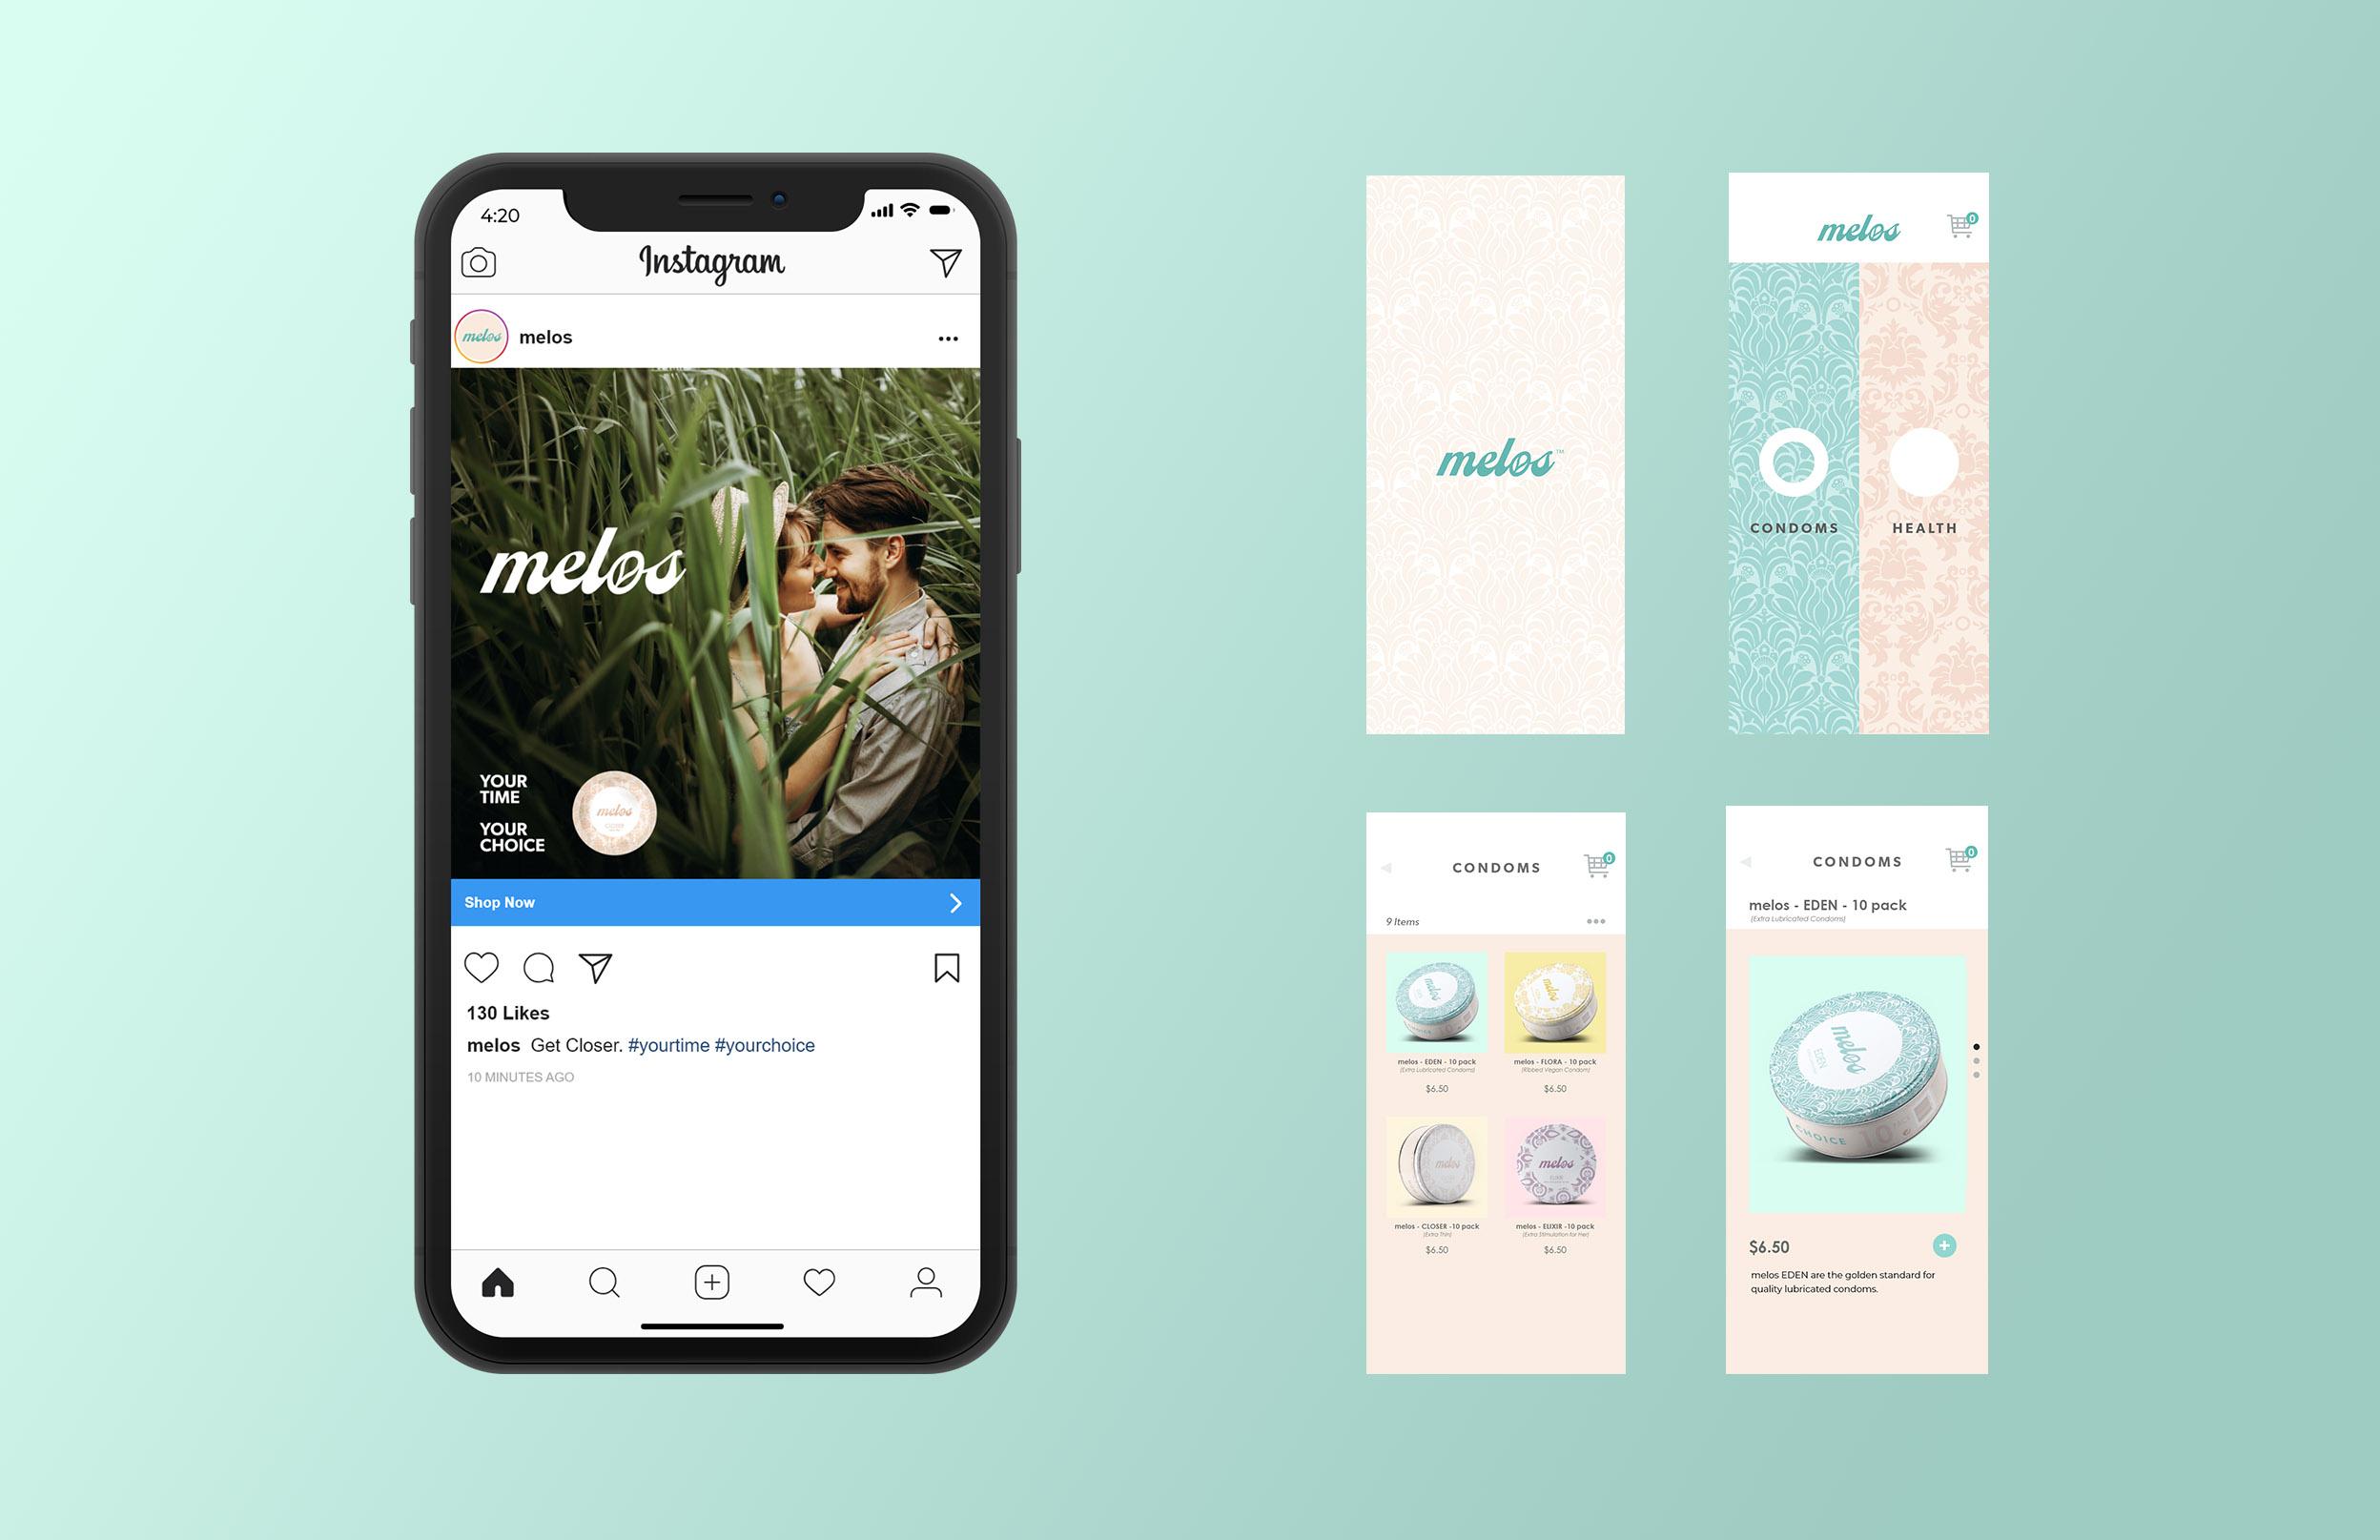 Melos_iPhone_plusscreens.jpg